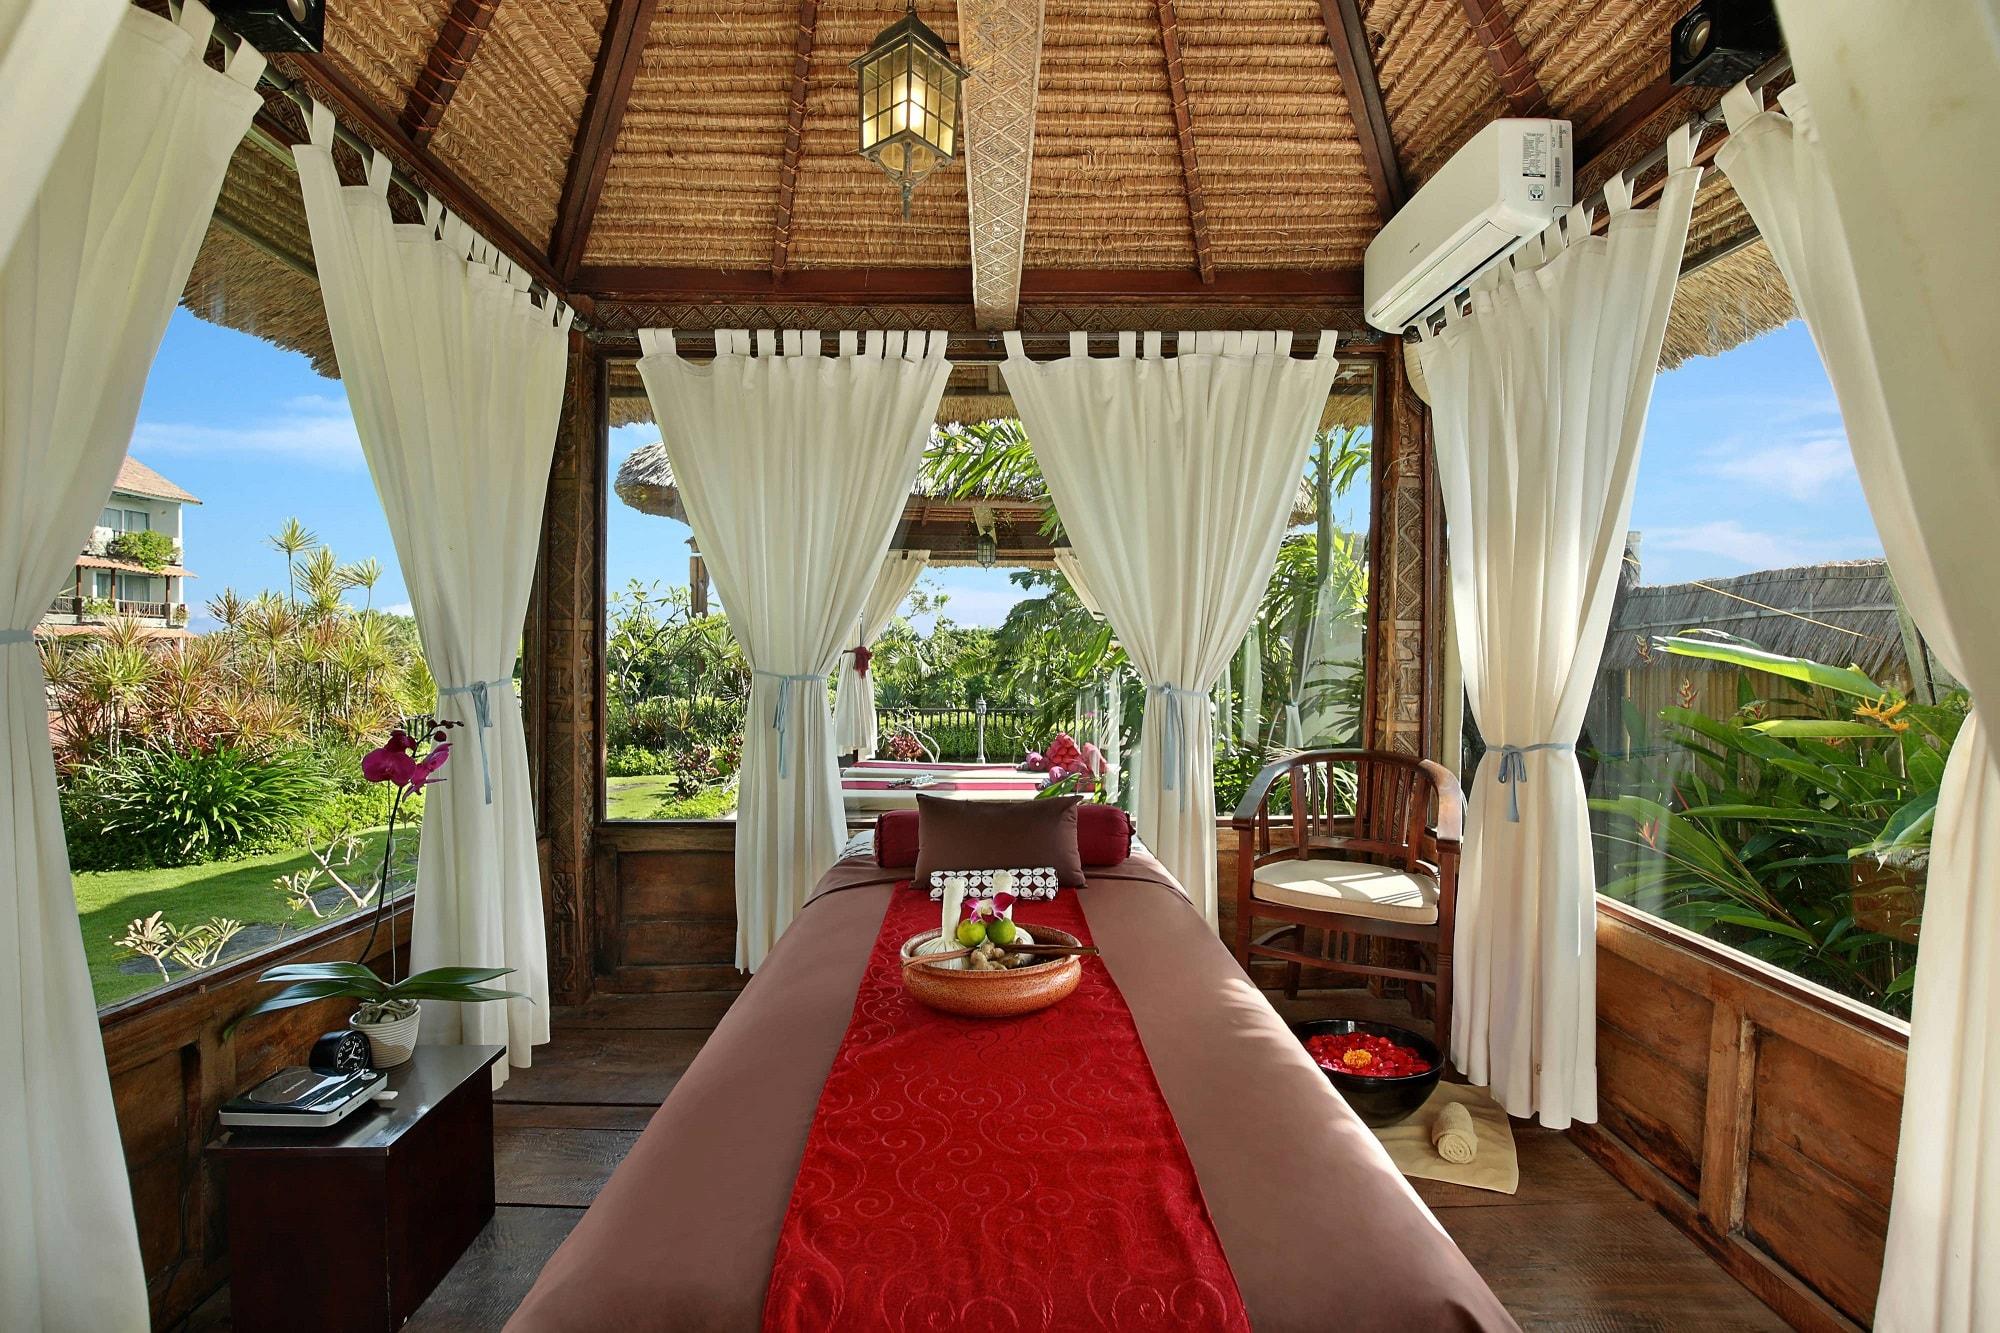 Swissbel Hotel Segara – Bali